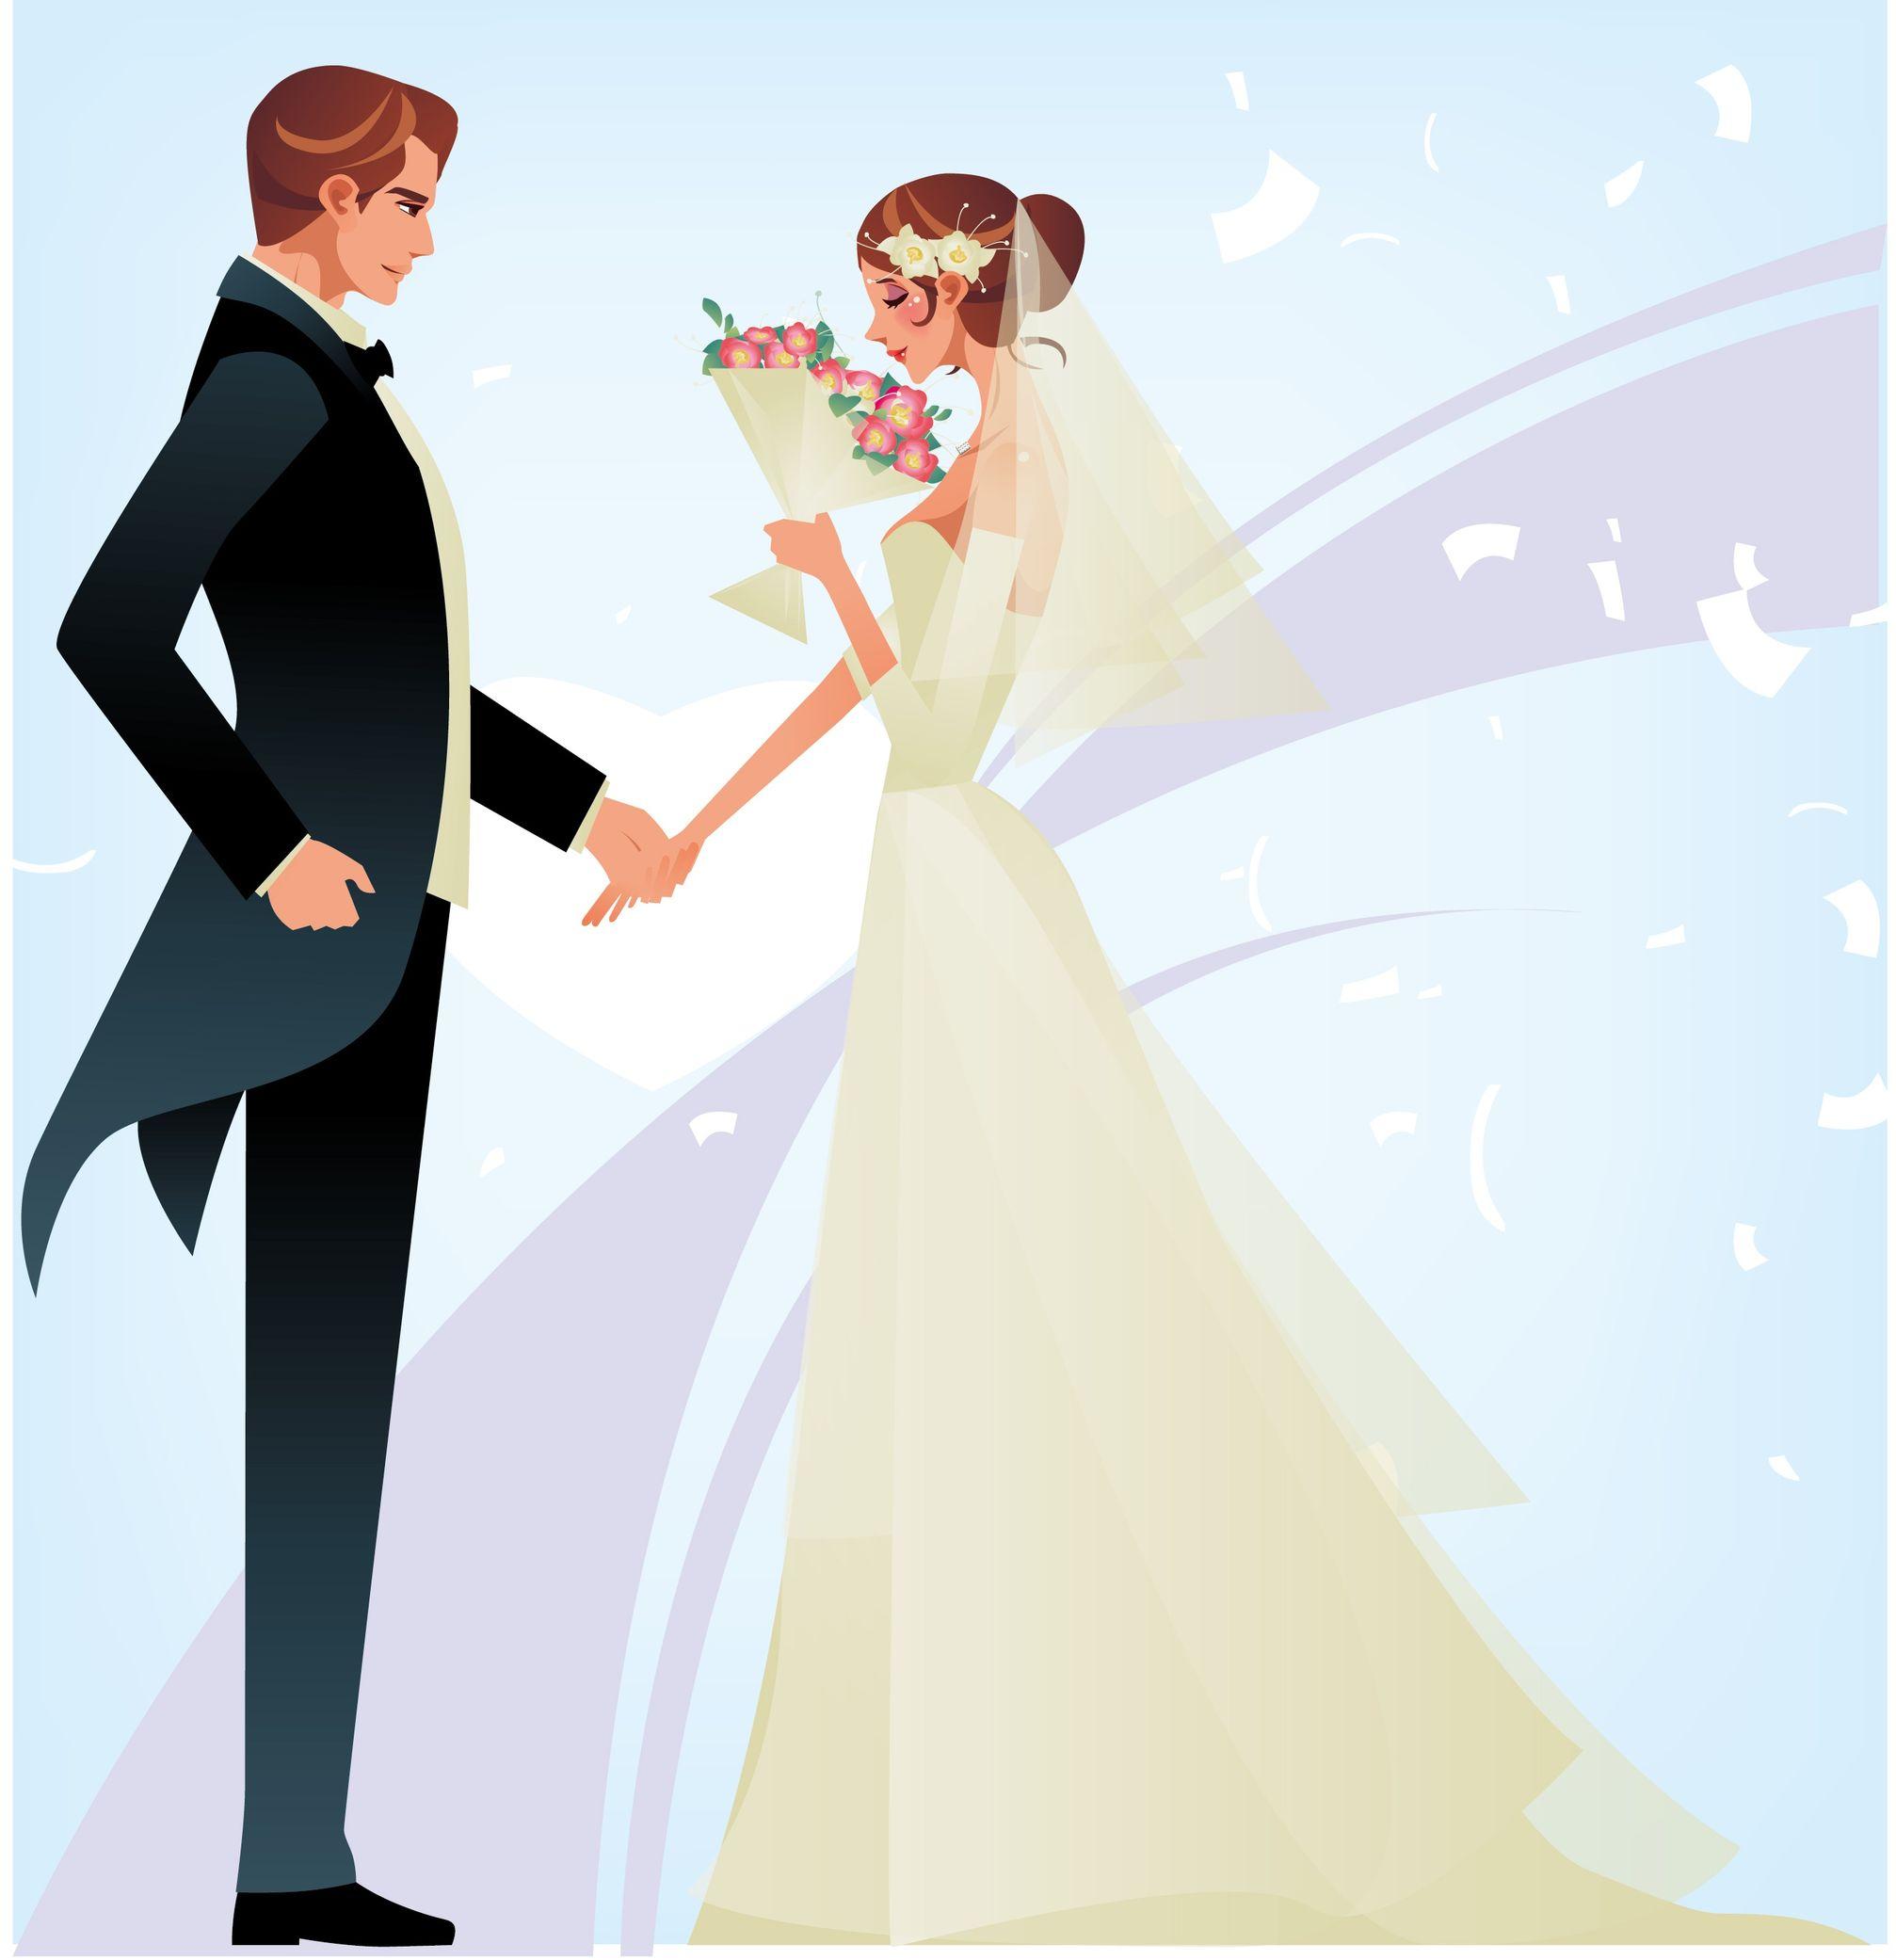 Catchy Wedding Guest What To Wear As A Wedding Guest Career Intelligence What To Wear To A Wedding Man Repeller Kmenfashionfashiontip 250263 Fashion Adviceml wedding What To Wear To A Wedding Men